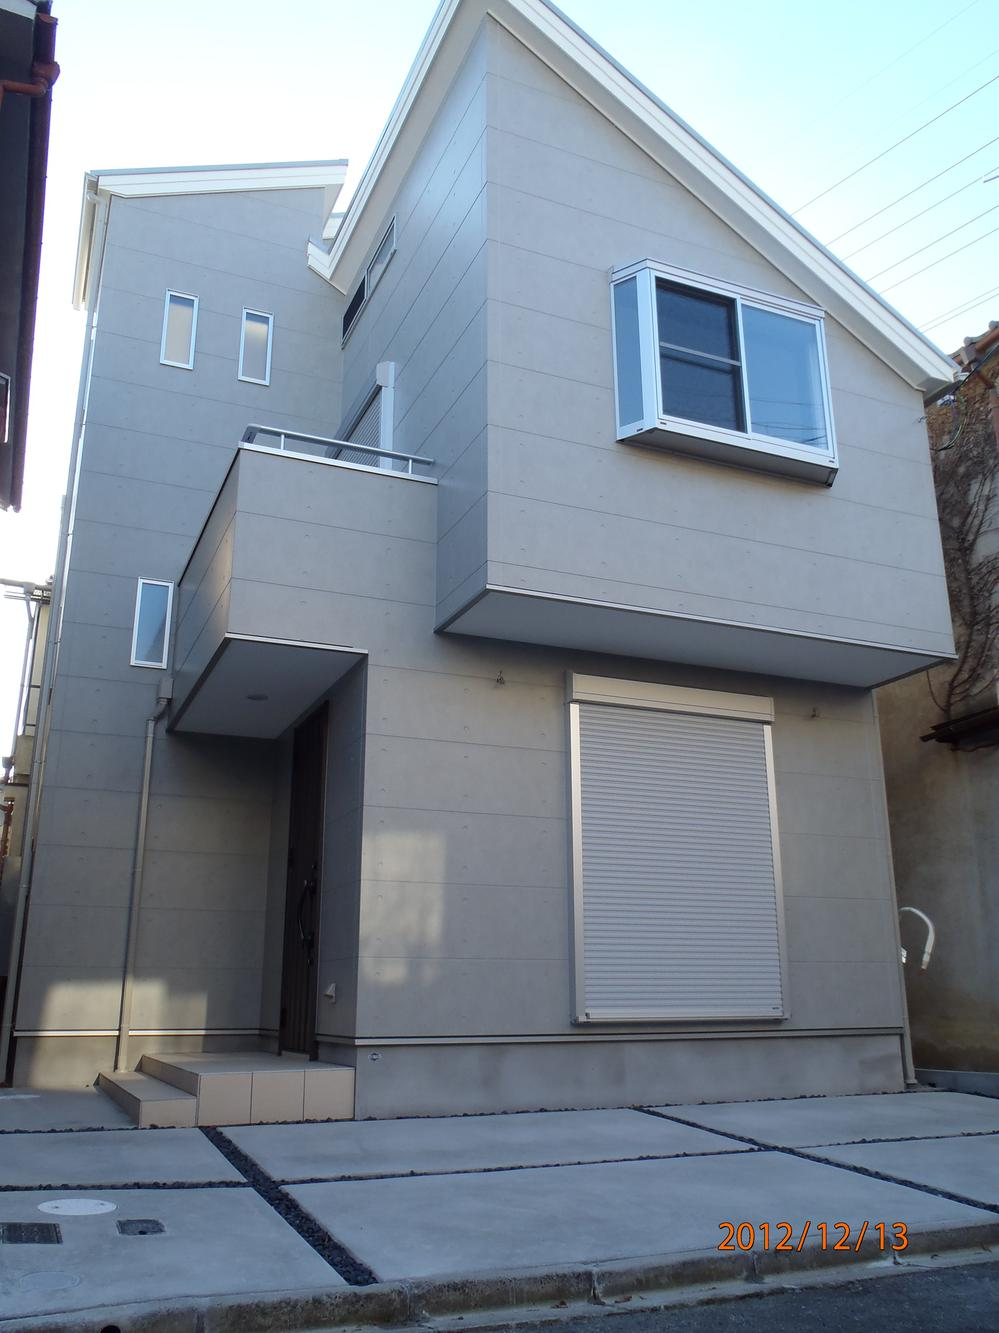 建物プラン例、土地価格400万円、土地面積49.07m<sup>2</sup>、建物価格1590万円、建物面積60.75m<sup>2</sup> 外観:推奨プラン